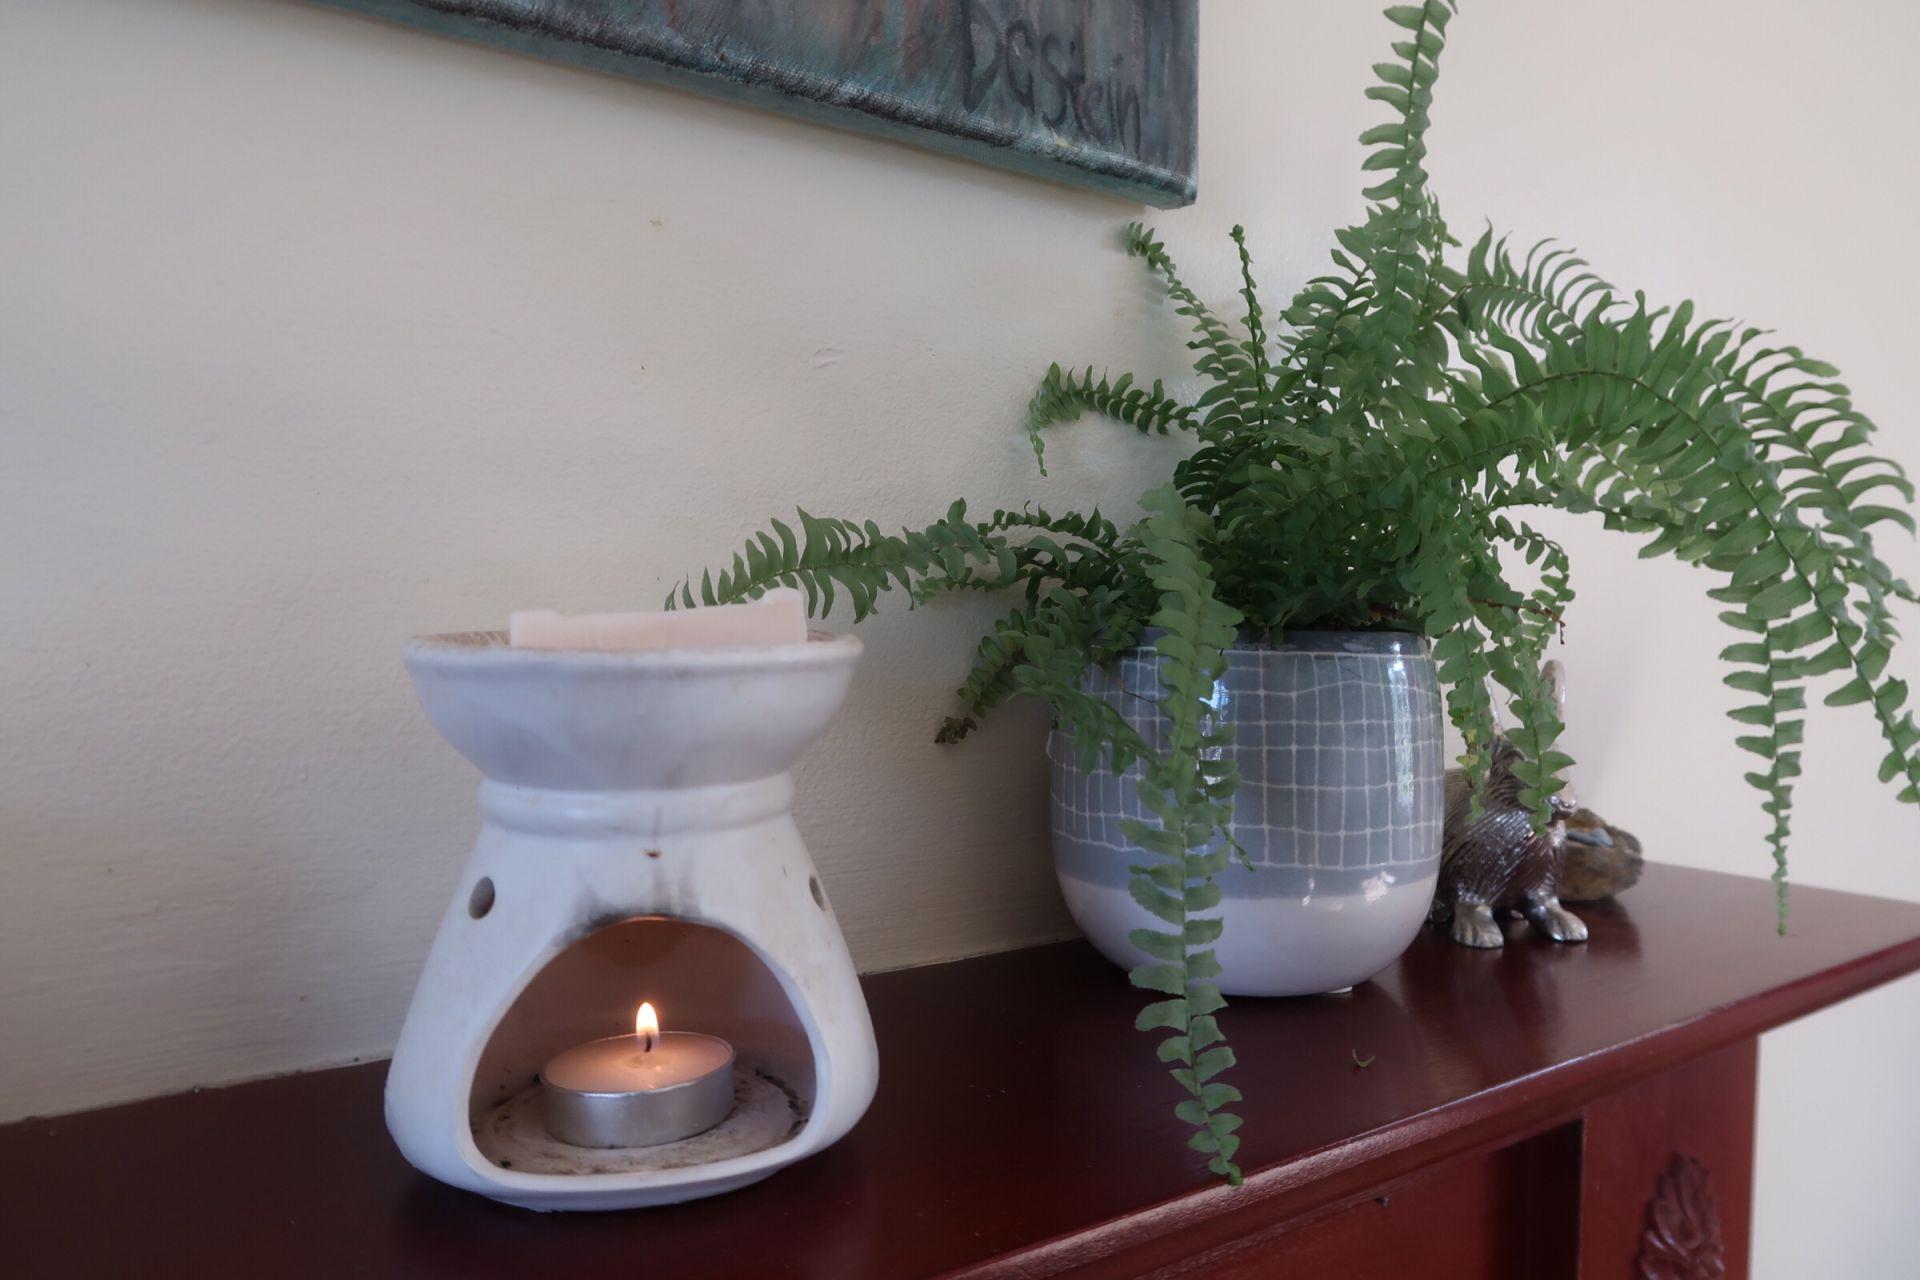 a candle burner lit next to a plant on a shelf